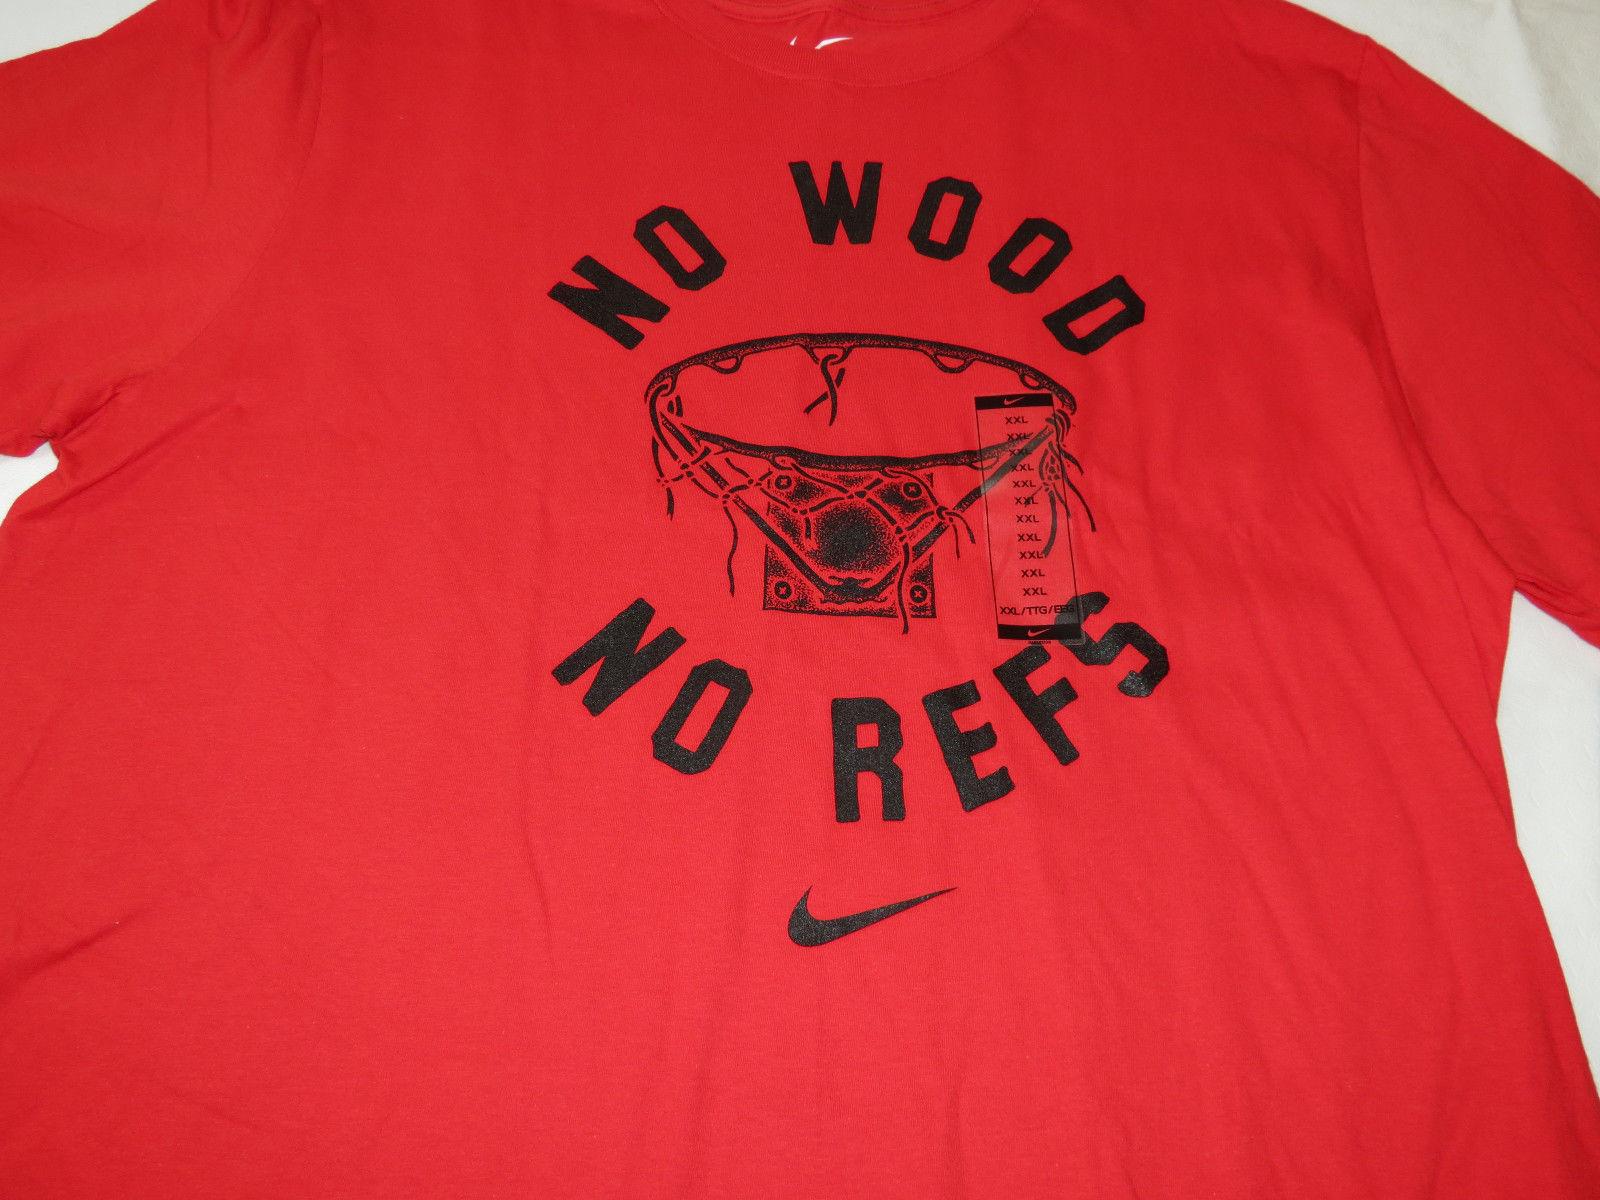 Nike Mens The Nike Tee Athletic cut XXL AH3208 657 red No Wood training t shirt